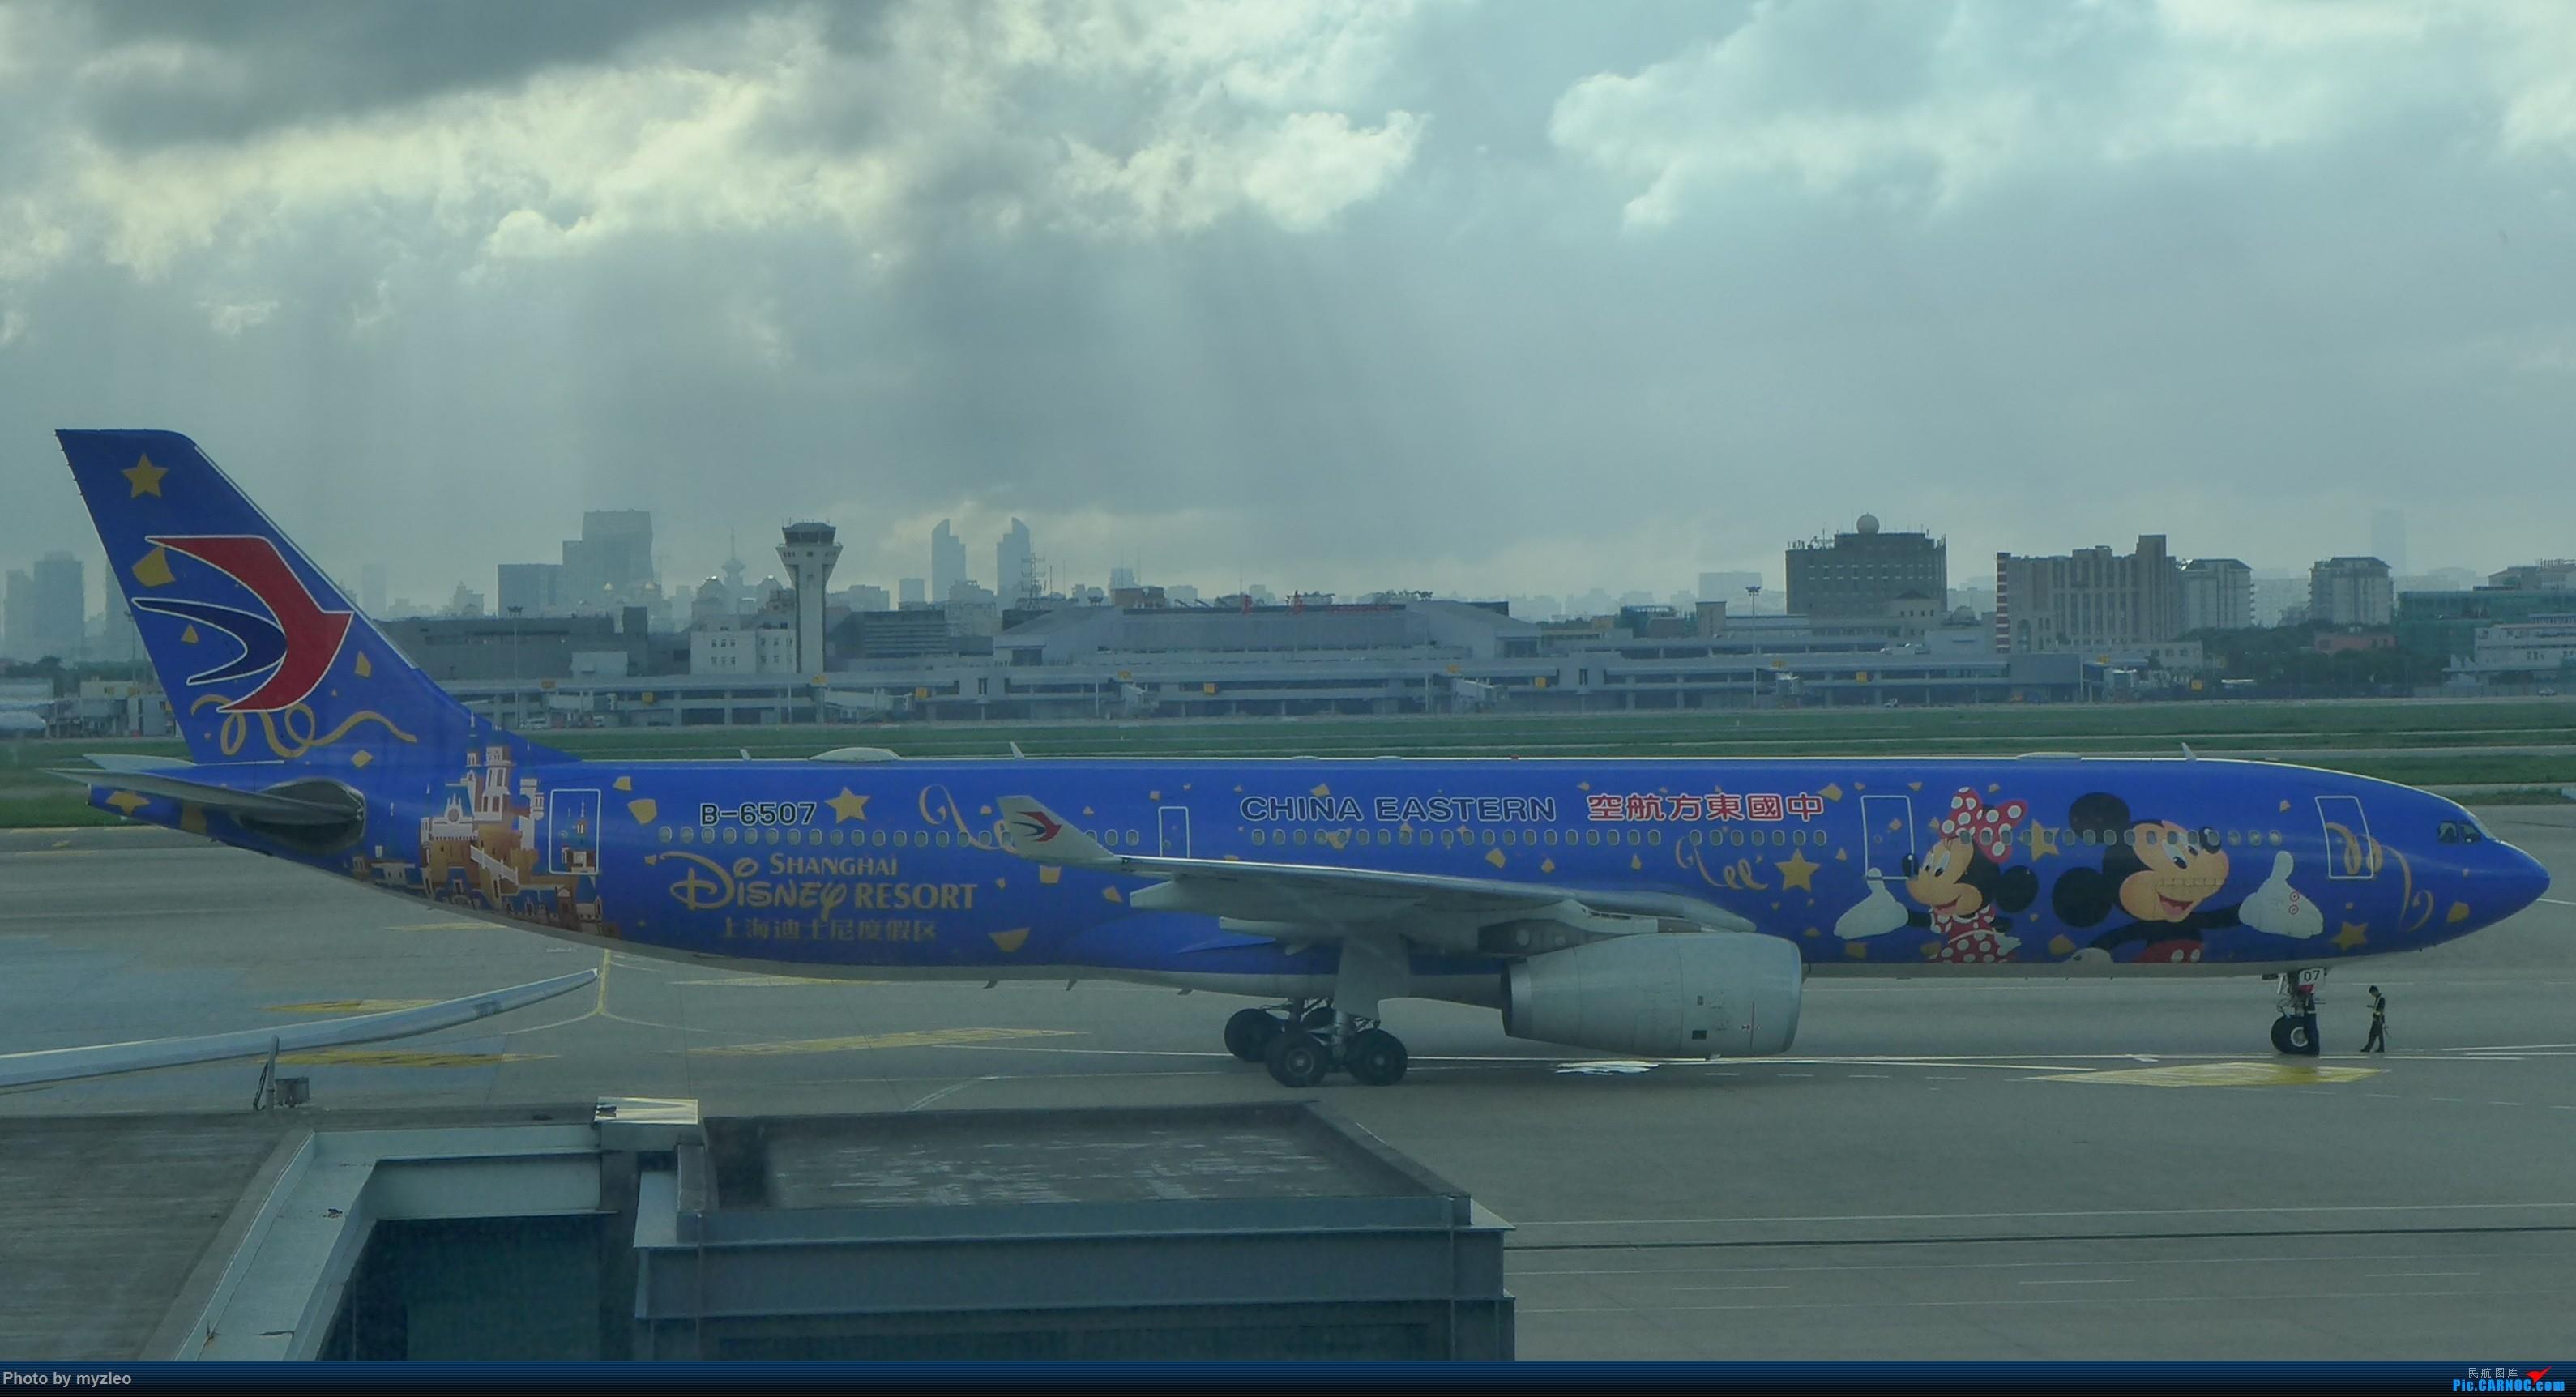 Re:[原创]【myzleo的游记3.1】三访帝都——记一次意外的惊喜,大鹅头初遇,第一次去中关村 AIRBUS A330-300 B-6507 中国上海虹桥国际机场